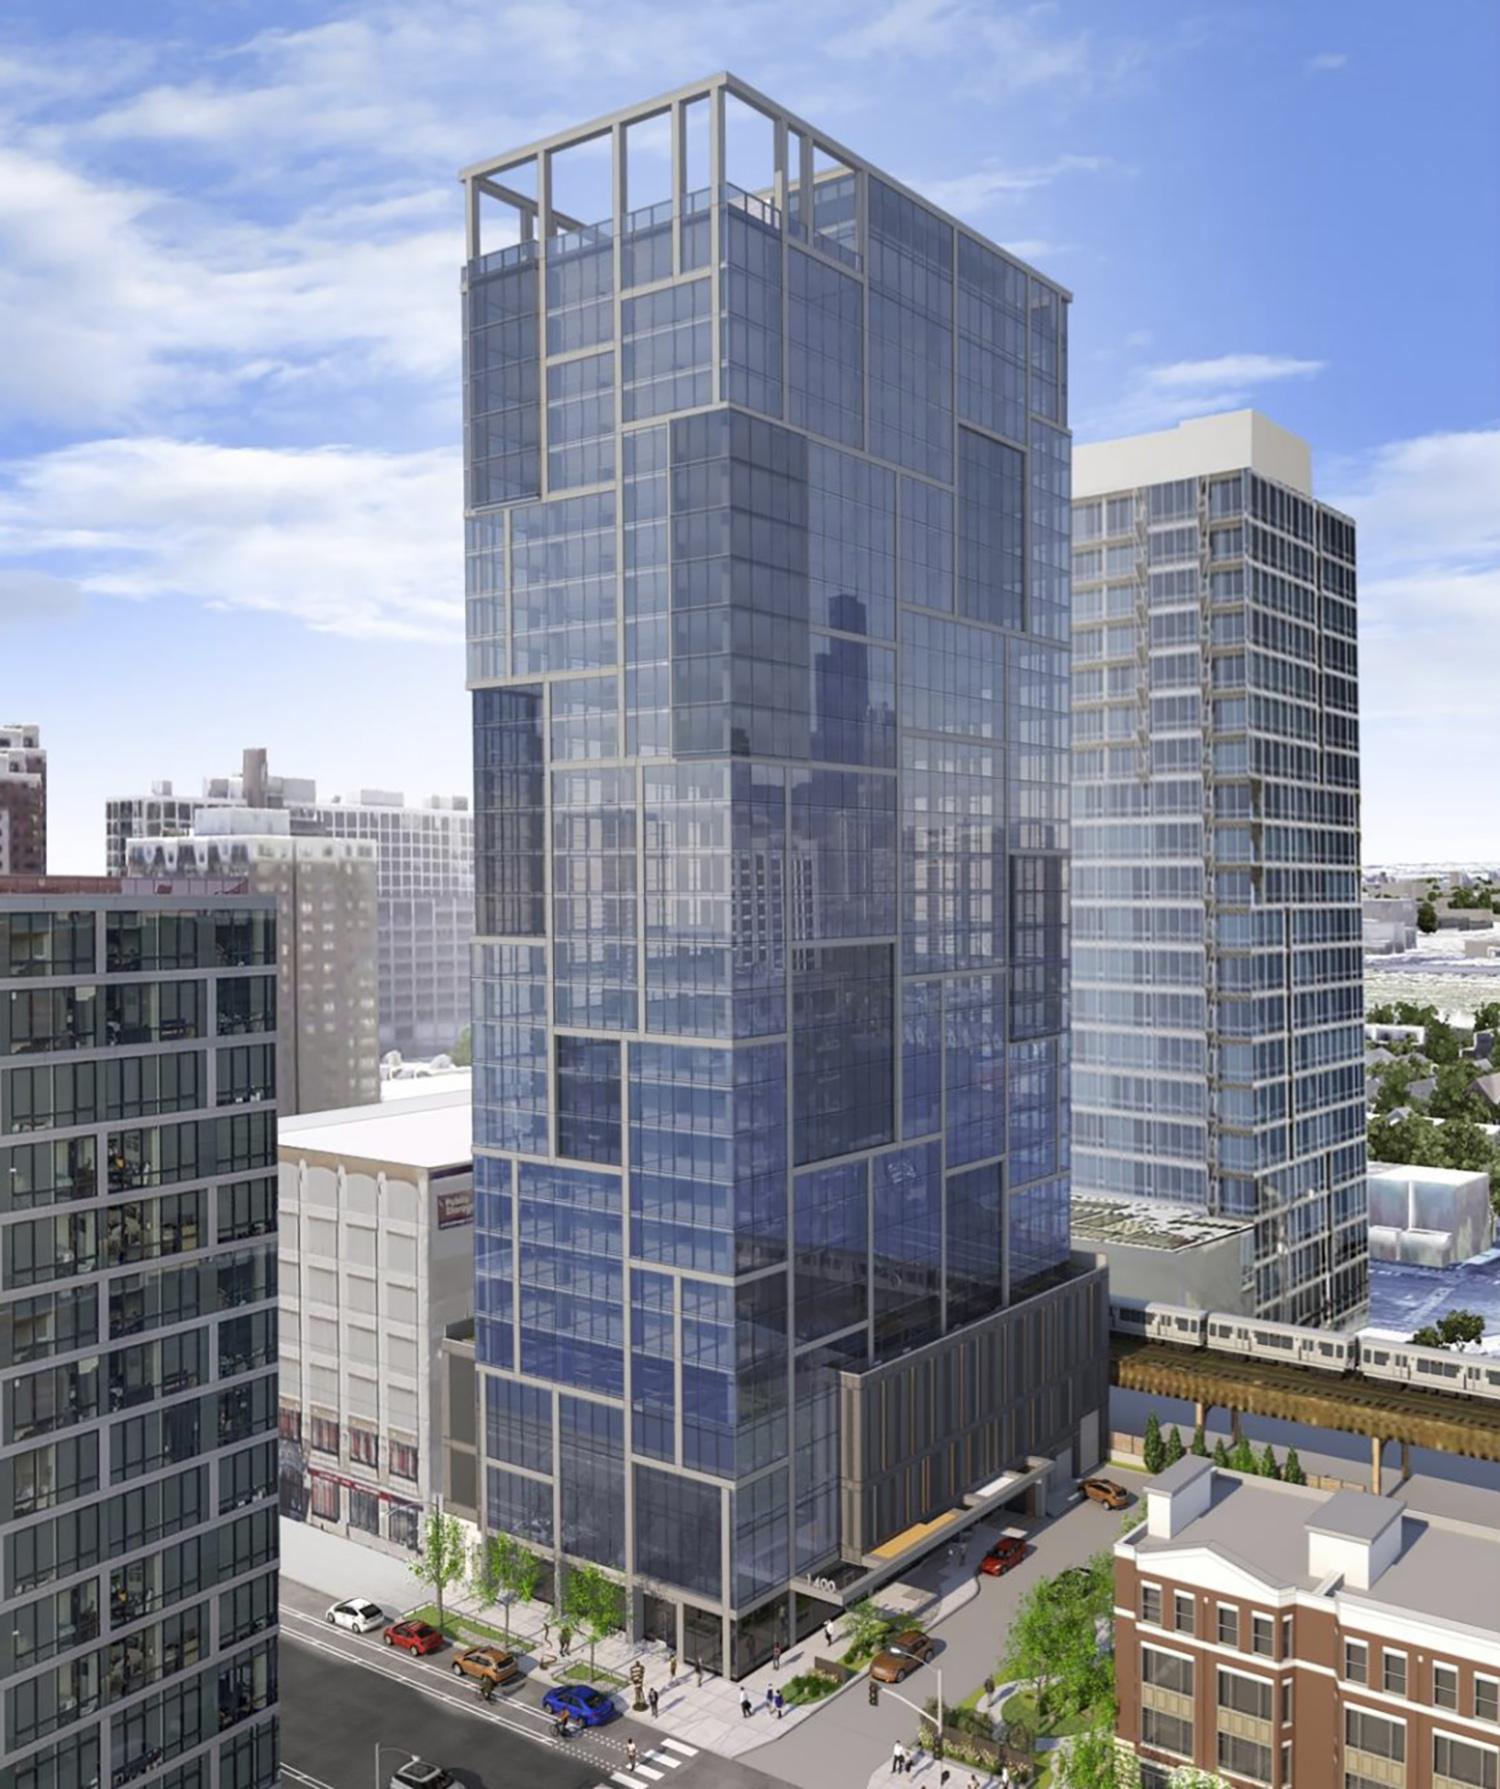 1400 S Wabash Avenue. Rendering by Pappageorge Haymes